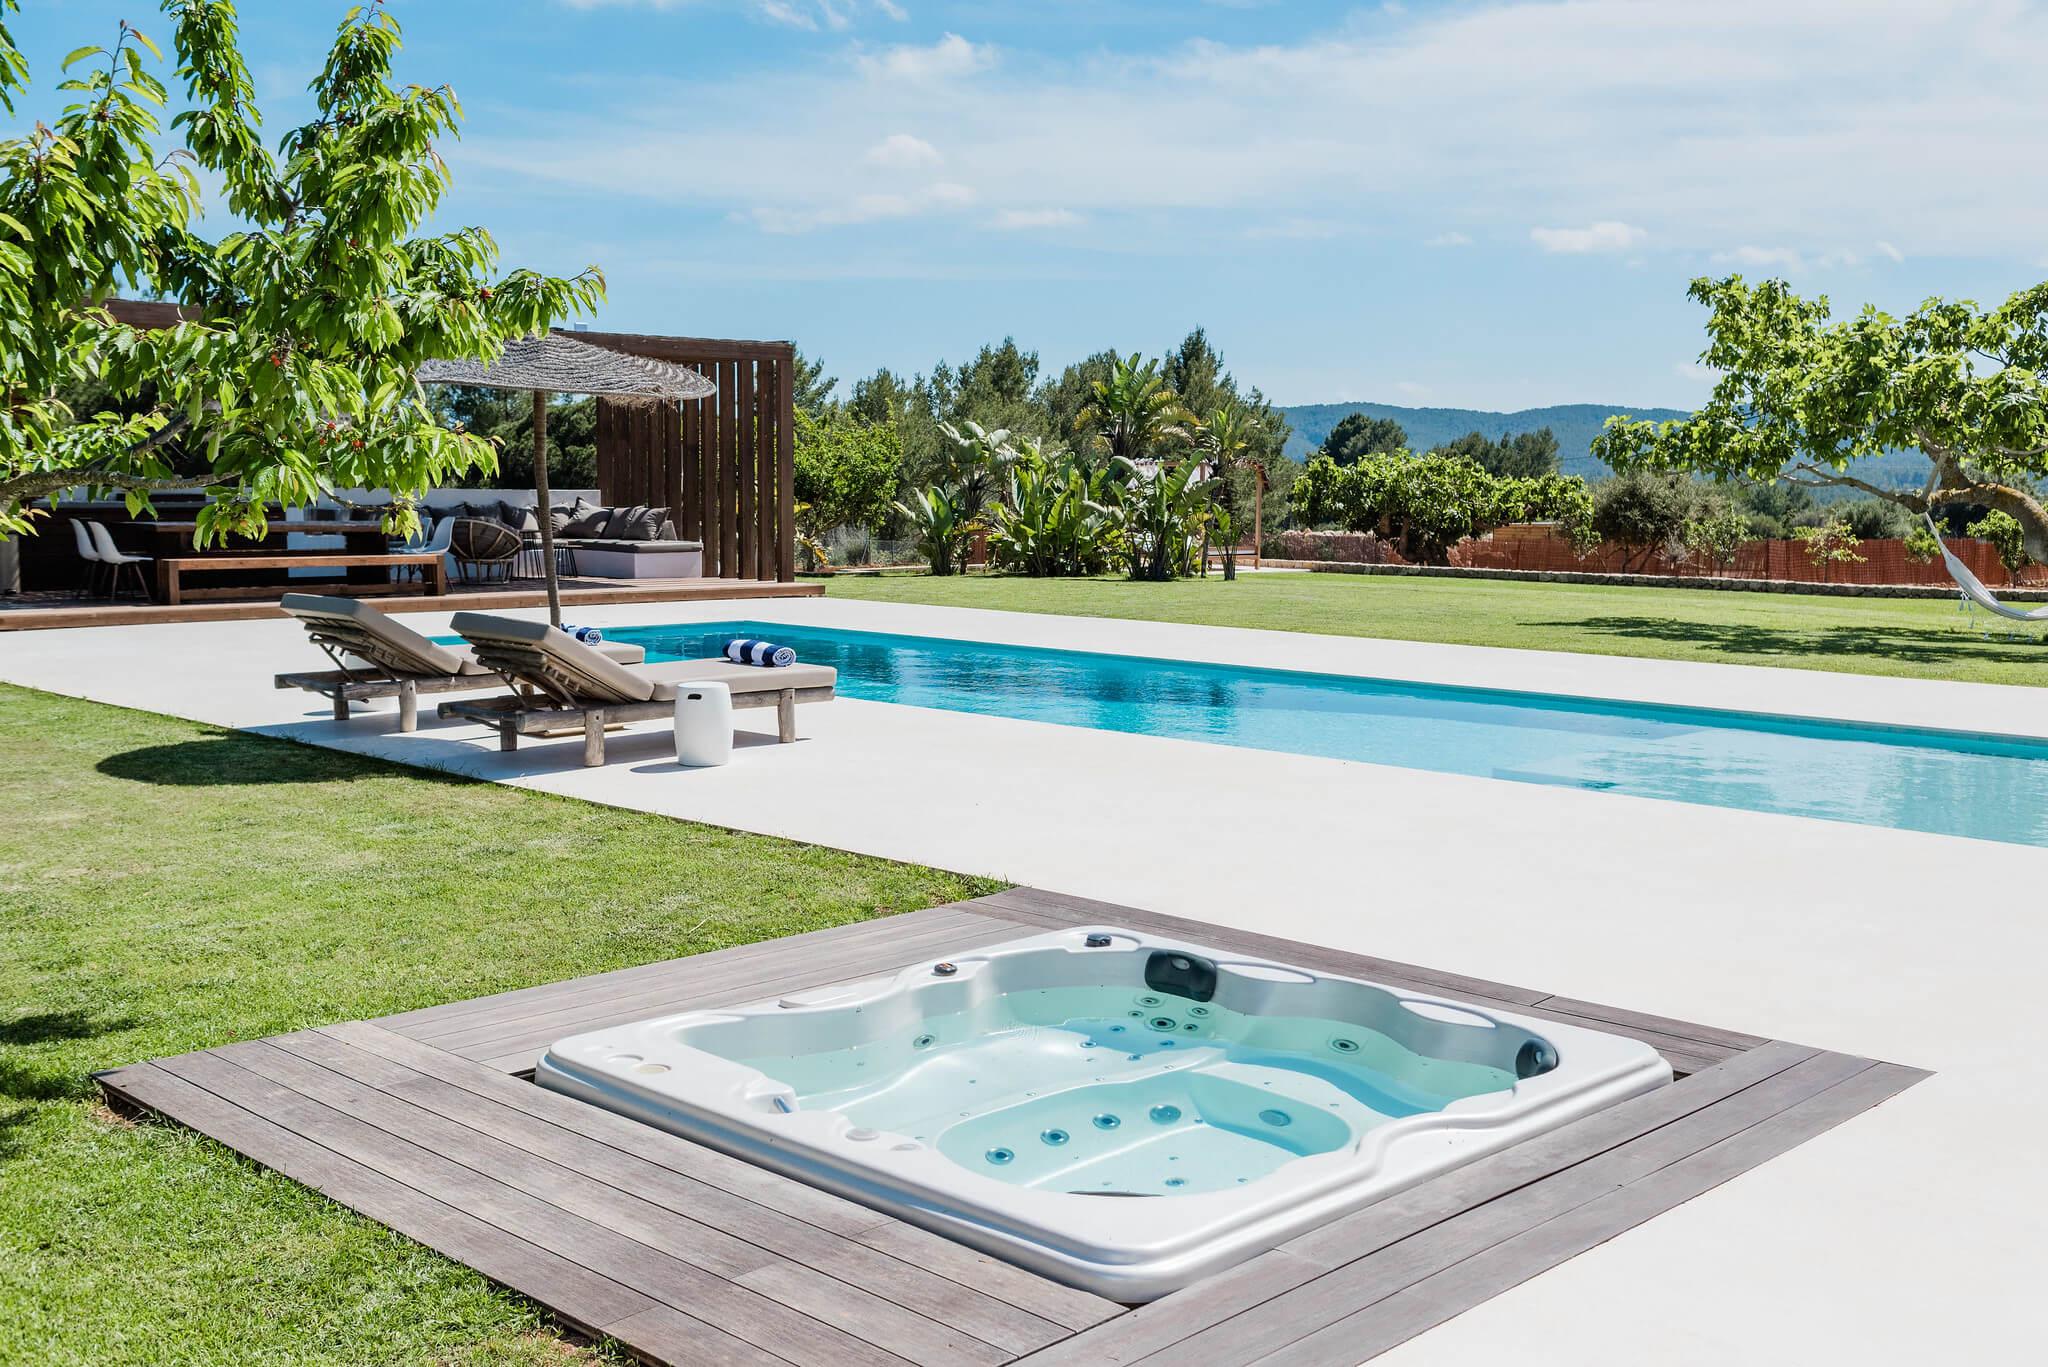 https://www.white-ibiza.com/wp-content/uploads/2020/06/white-ibiza-villas-can-carmen-exterior-hot-tub.jpg